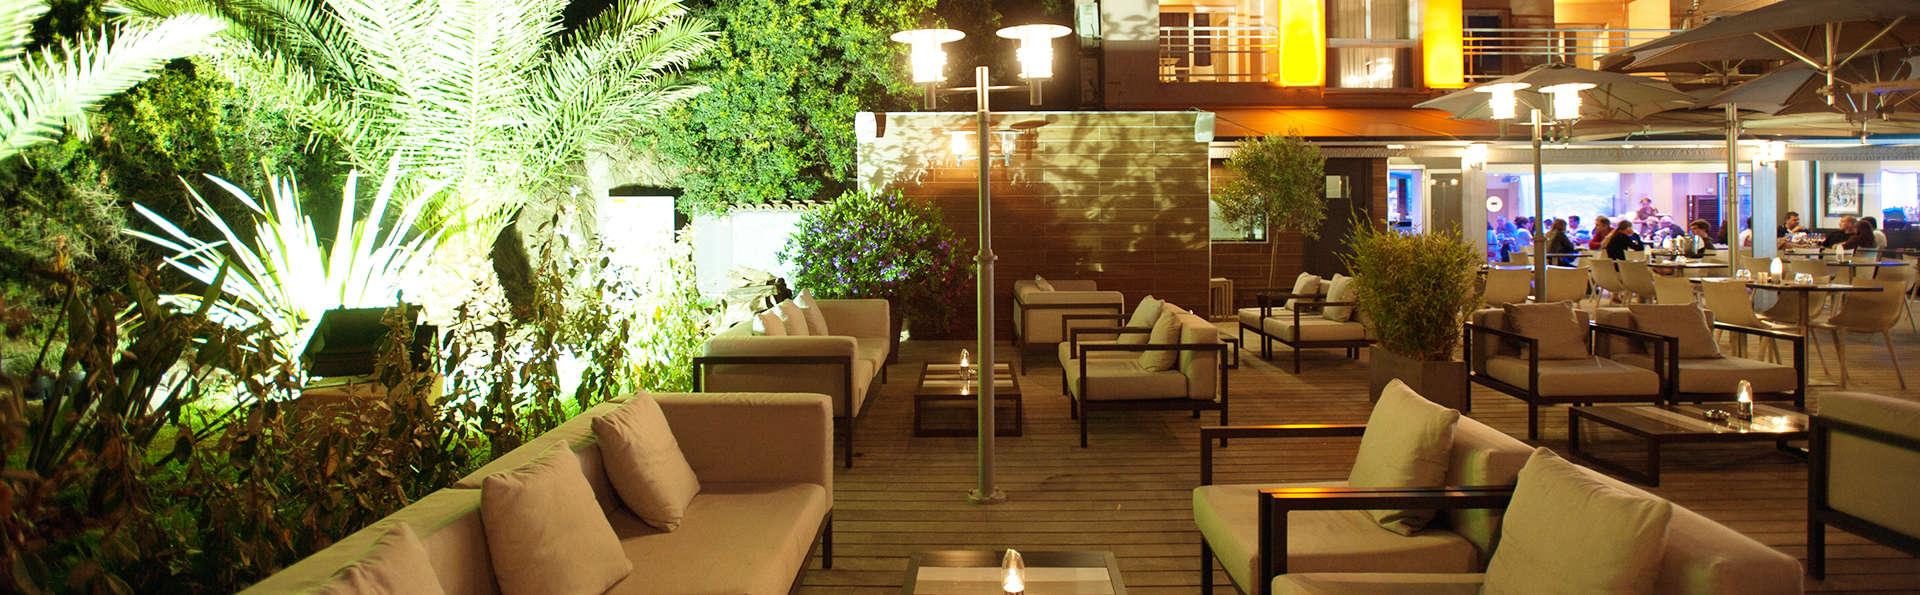 Hôtel Le Golfe - EDIT_terraza_3.jpg